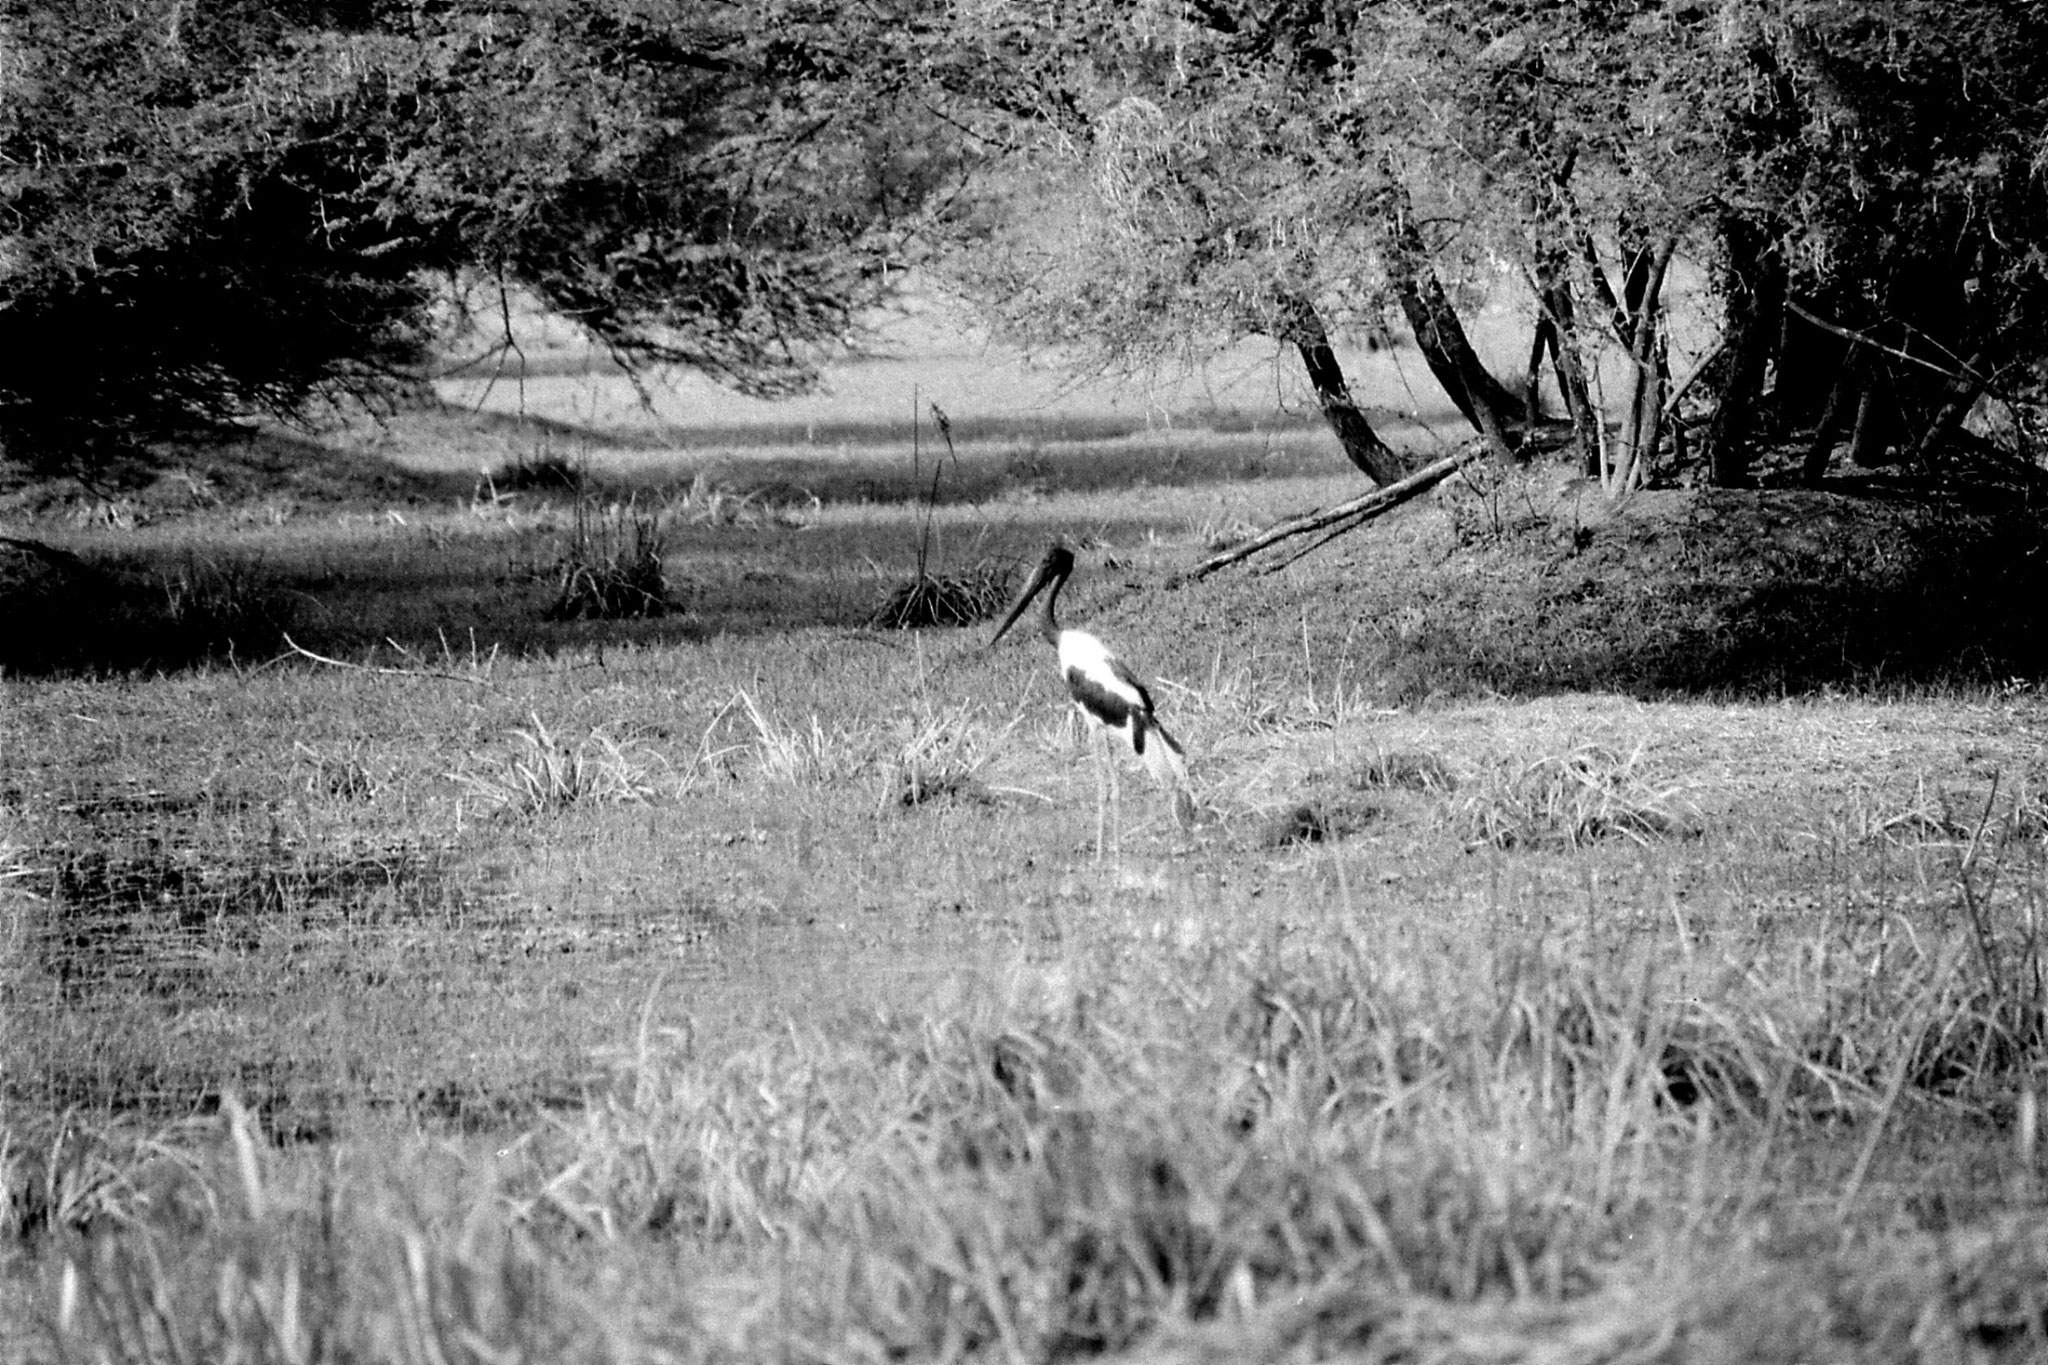 1/4/1990: 19: Bharatpur Black necked stork